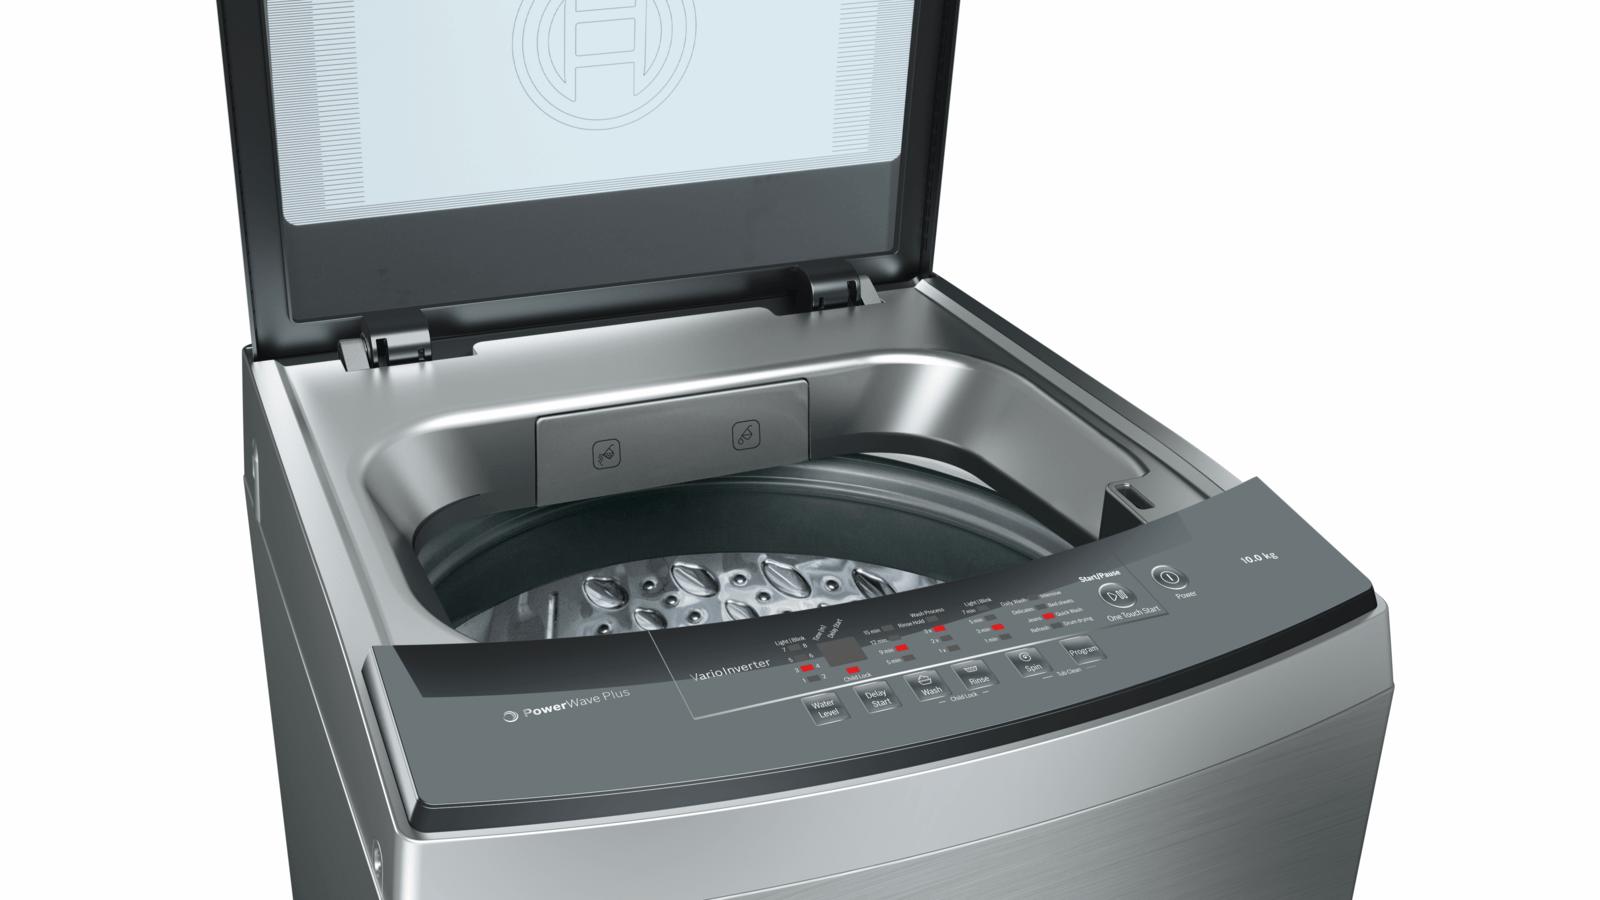 BOSCH - WOA104X0SG - Washing machine, top loader